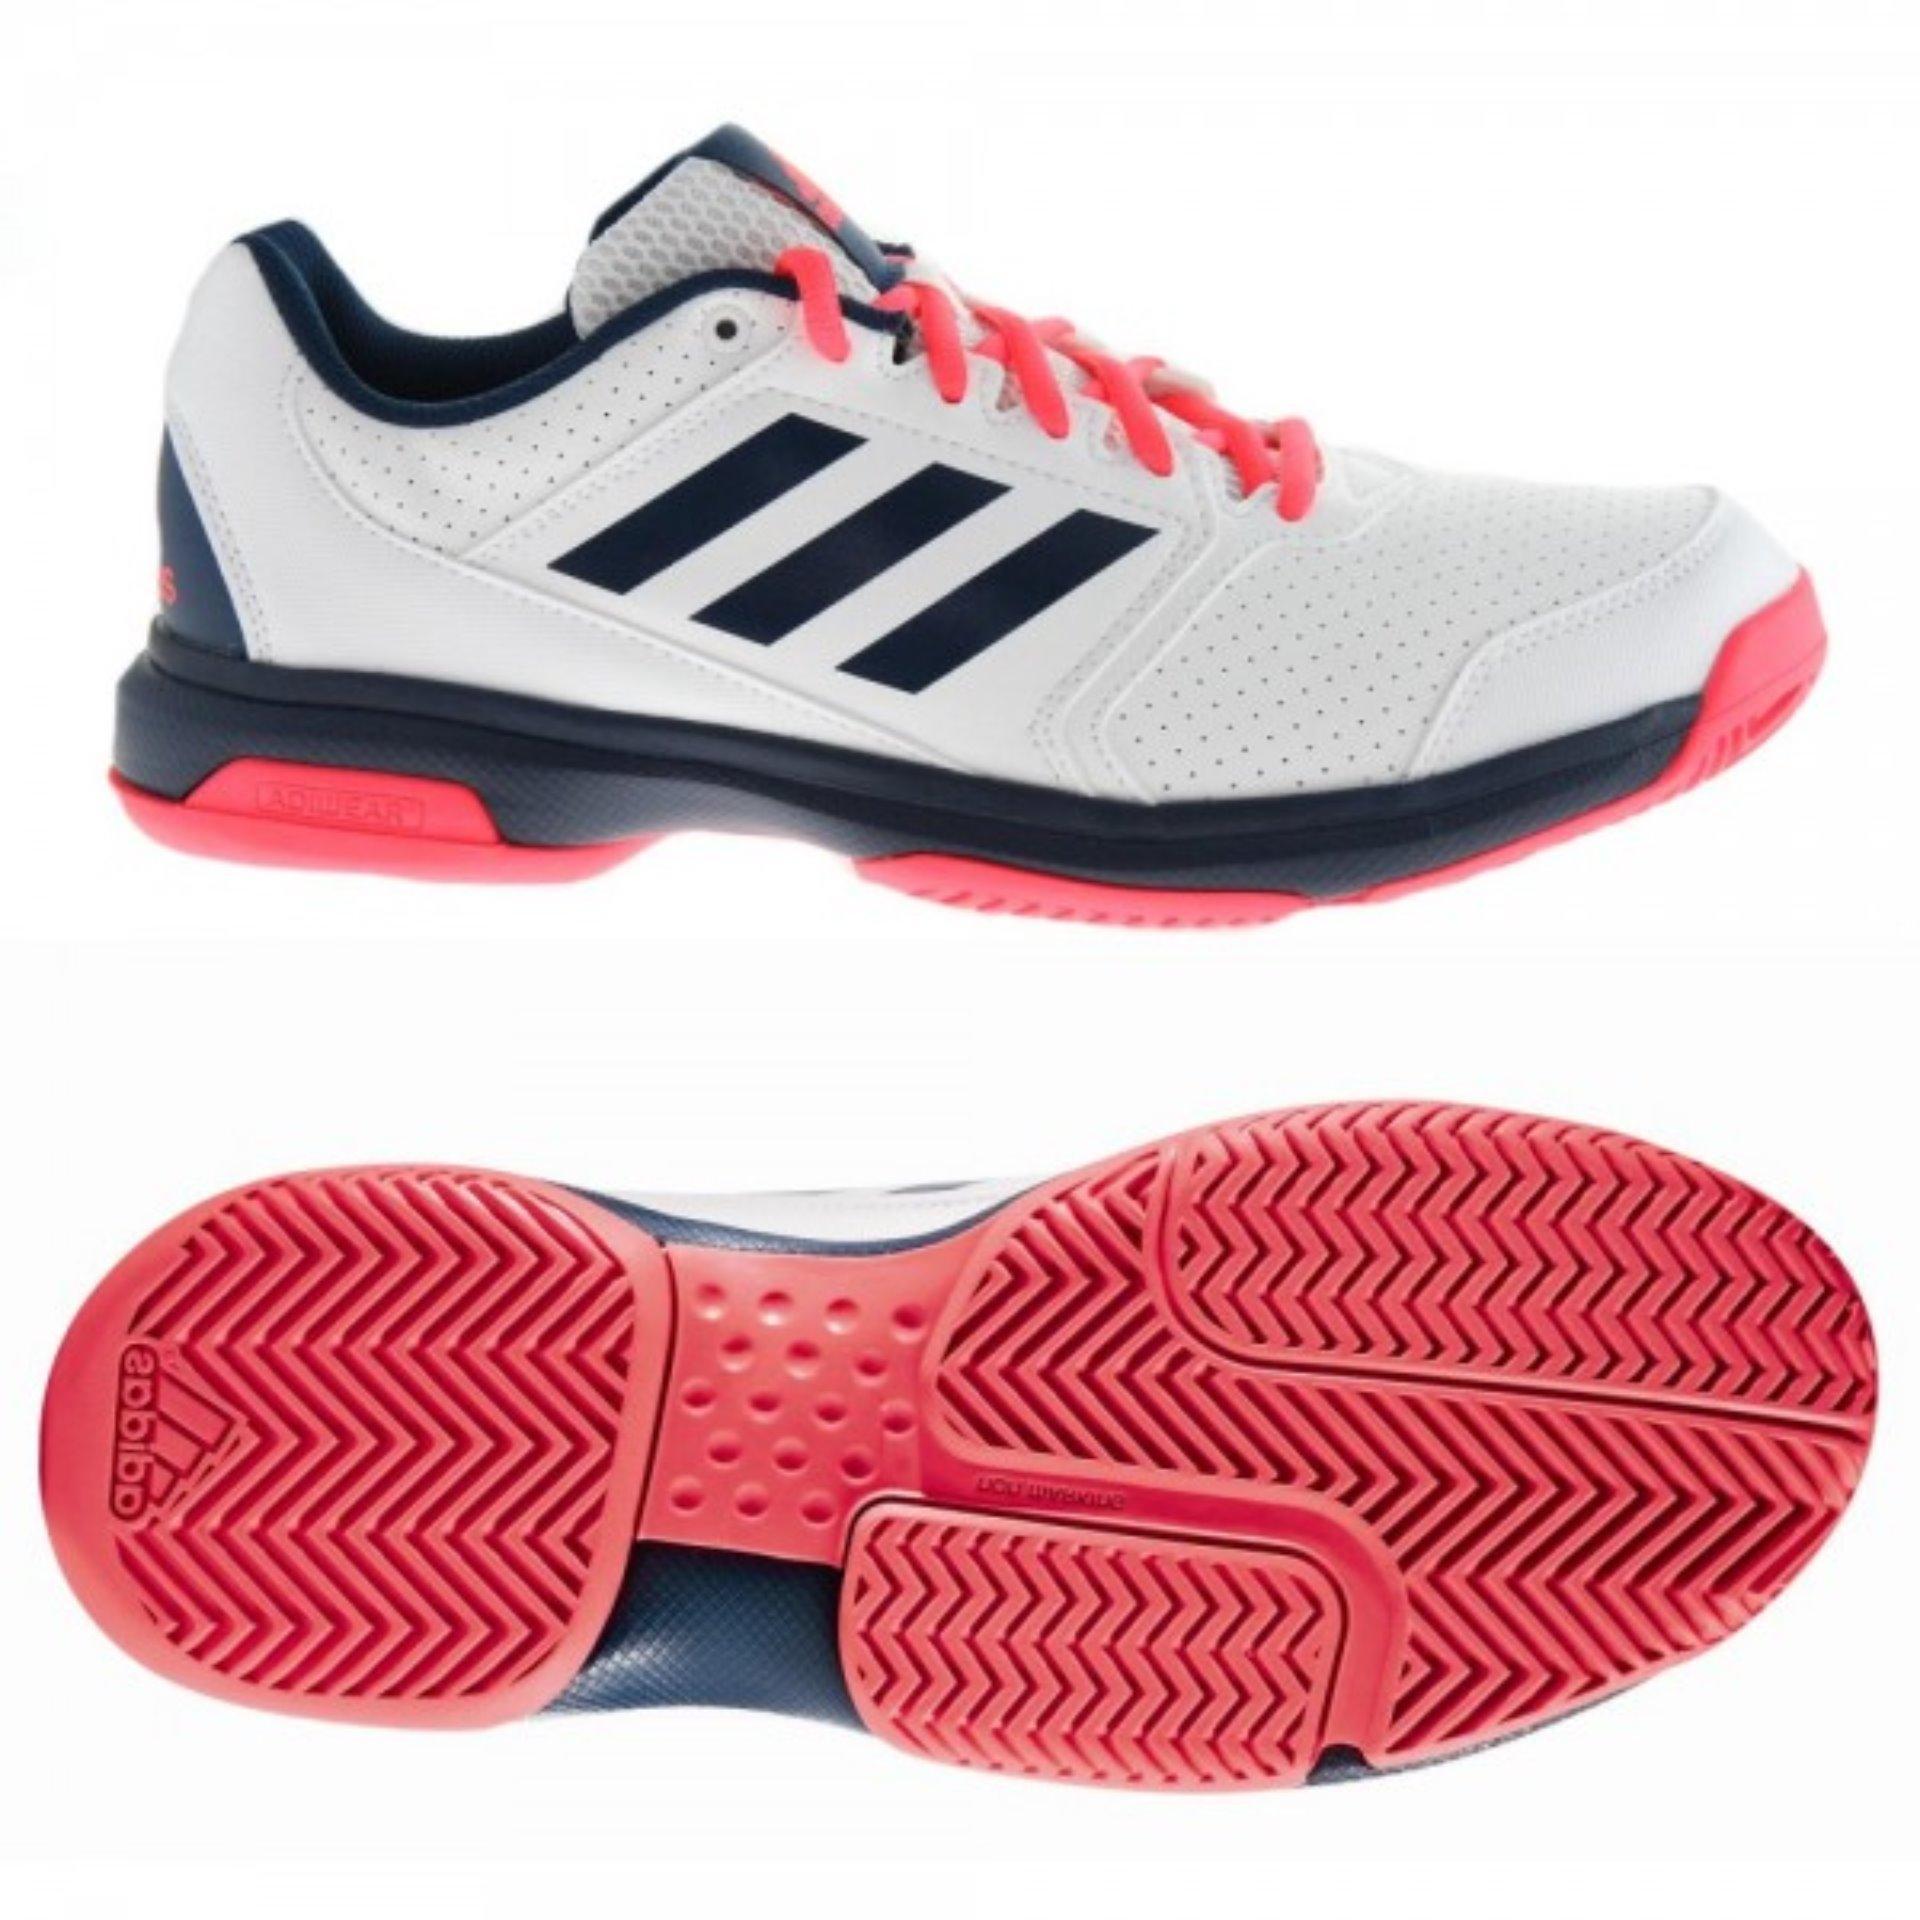 Adidas Sepatu Tennis Barricade Court Wide Bb3363 Putih - Daftar ... 0595cd831c